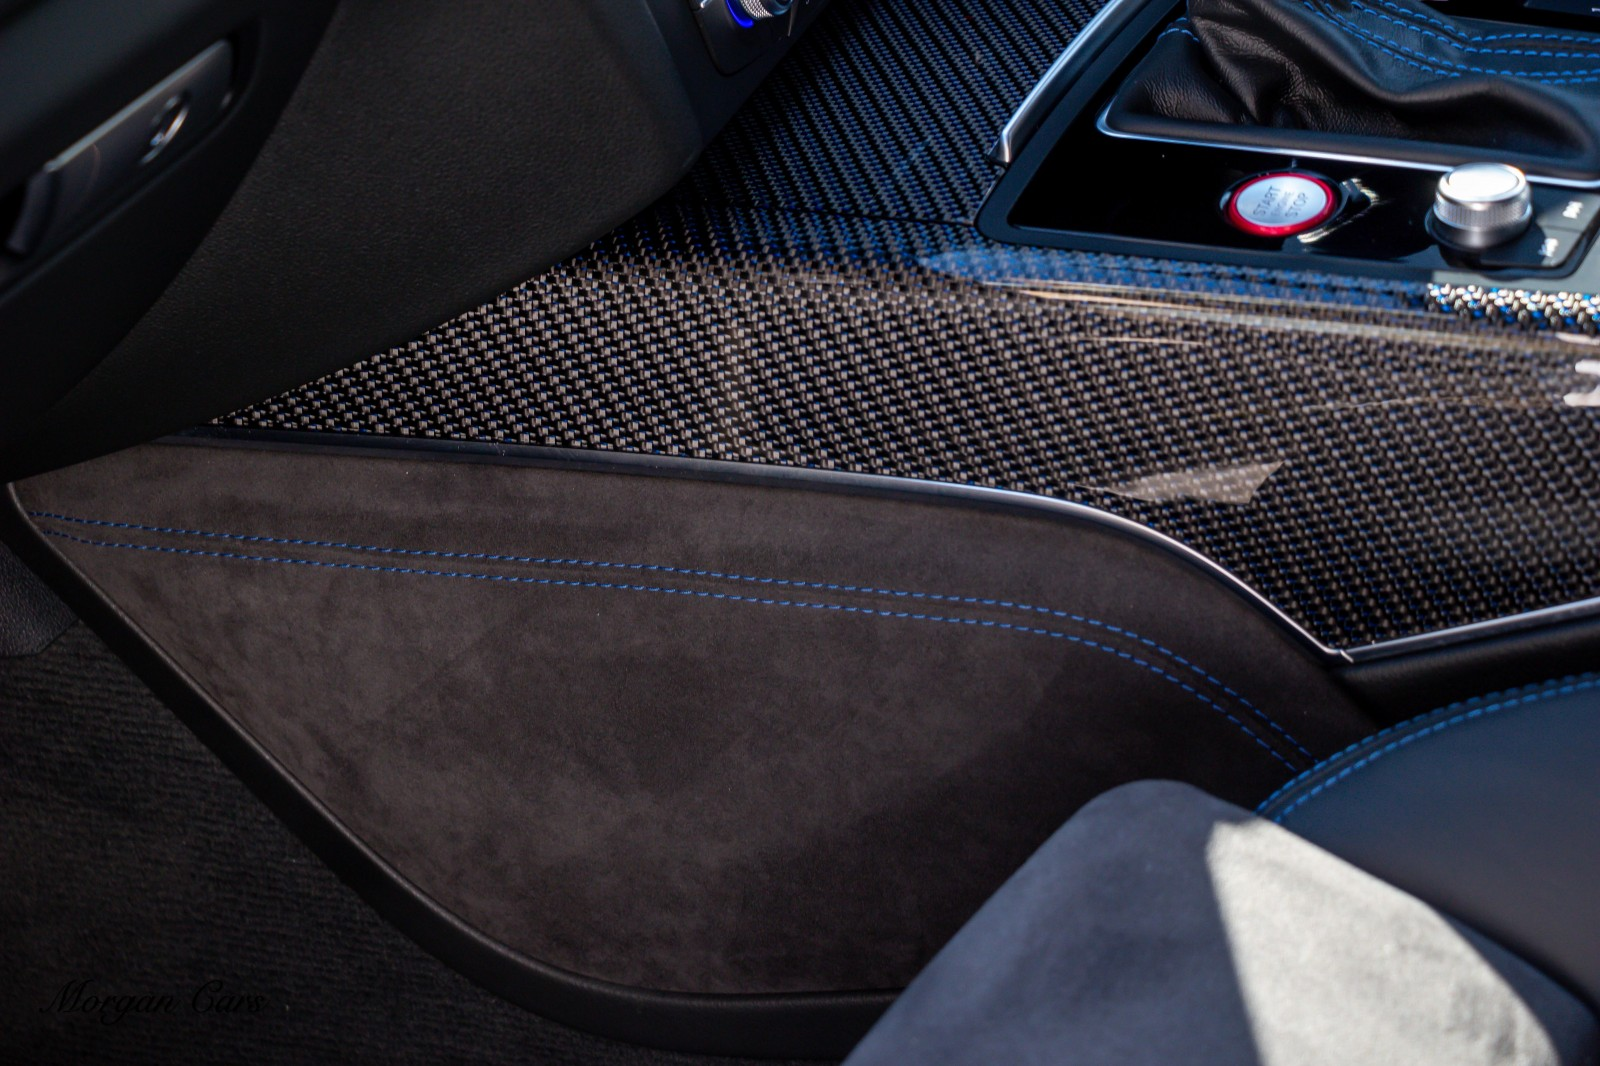 2017 Audi A6 RS6 PERFORMANCE AVANT TFSI QUATTRO Petrol Automatic – Morgan Cars 9 Mound Road, Warrenpoint, Newry BT34 3LW, UK full